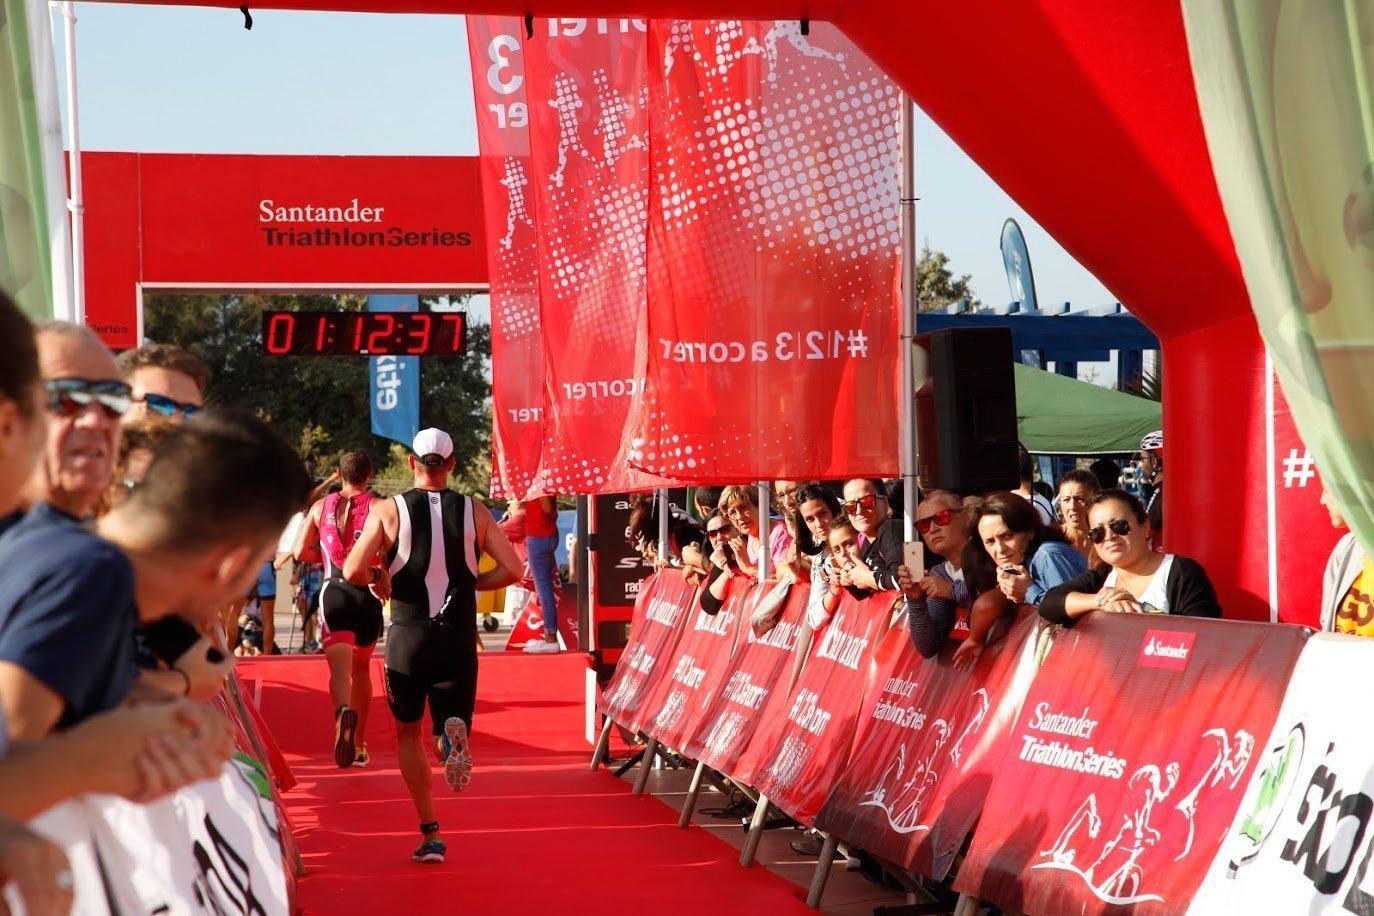 Santander Triathlon Series 2016 - Malaga 1